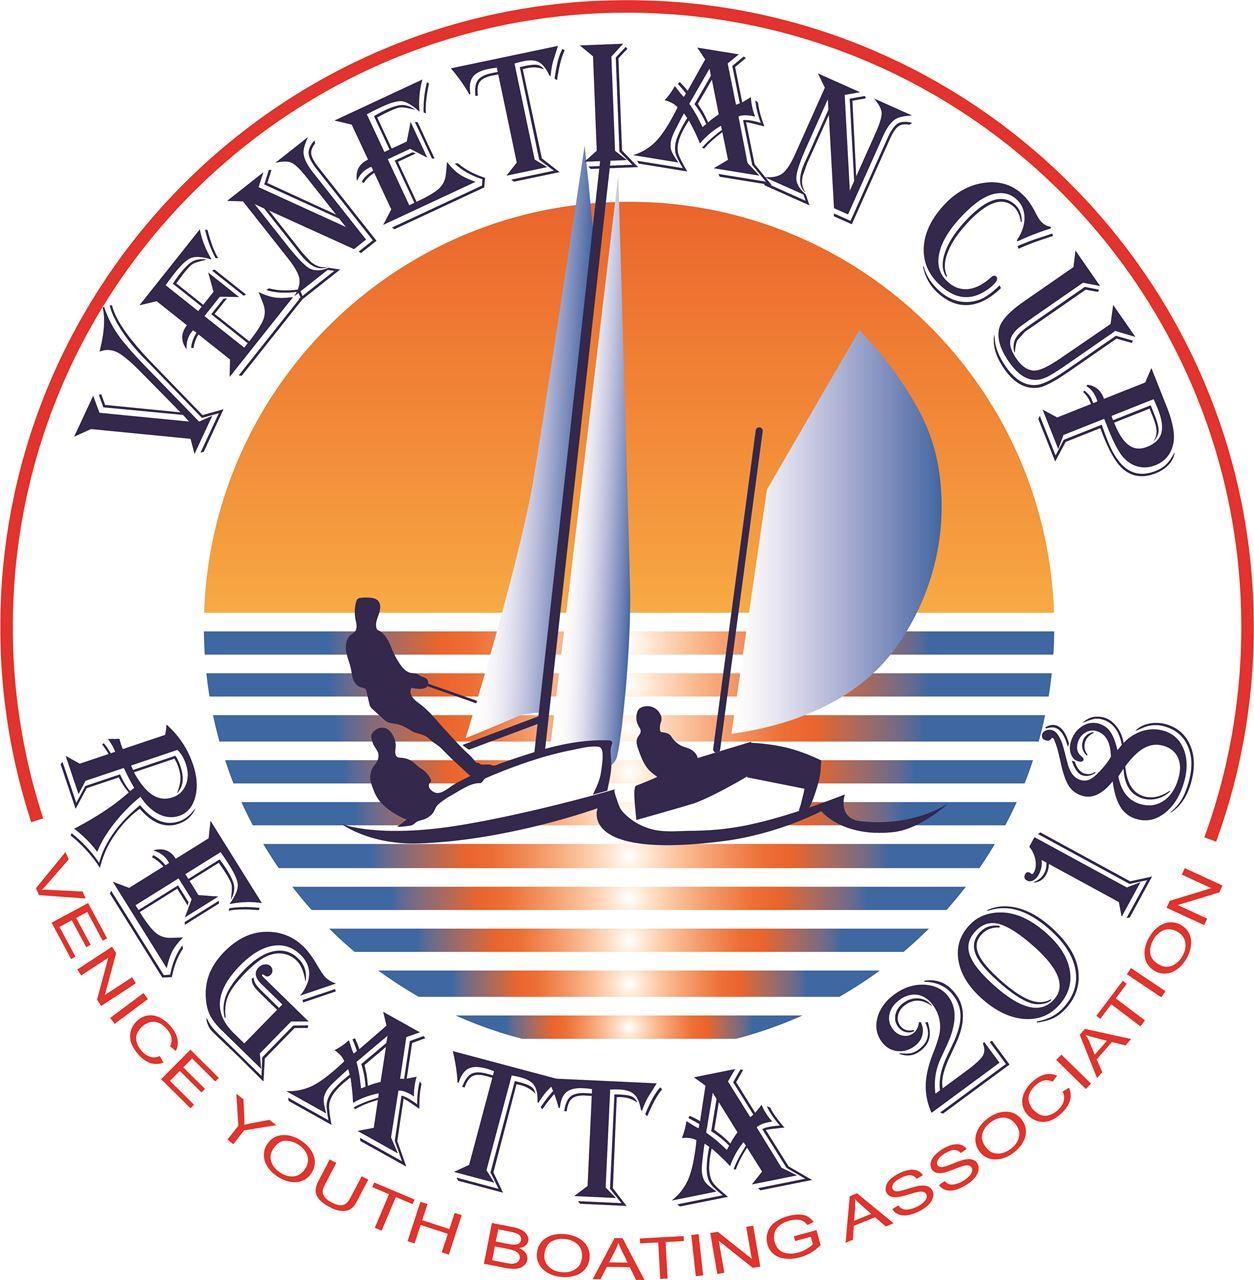 Venice Youth Boating Association - Regattas